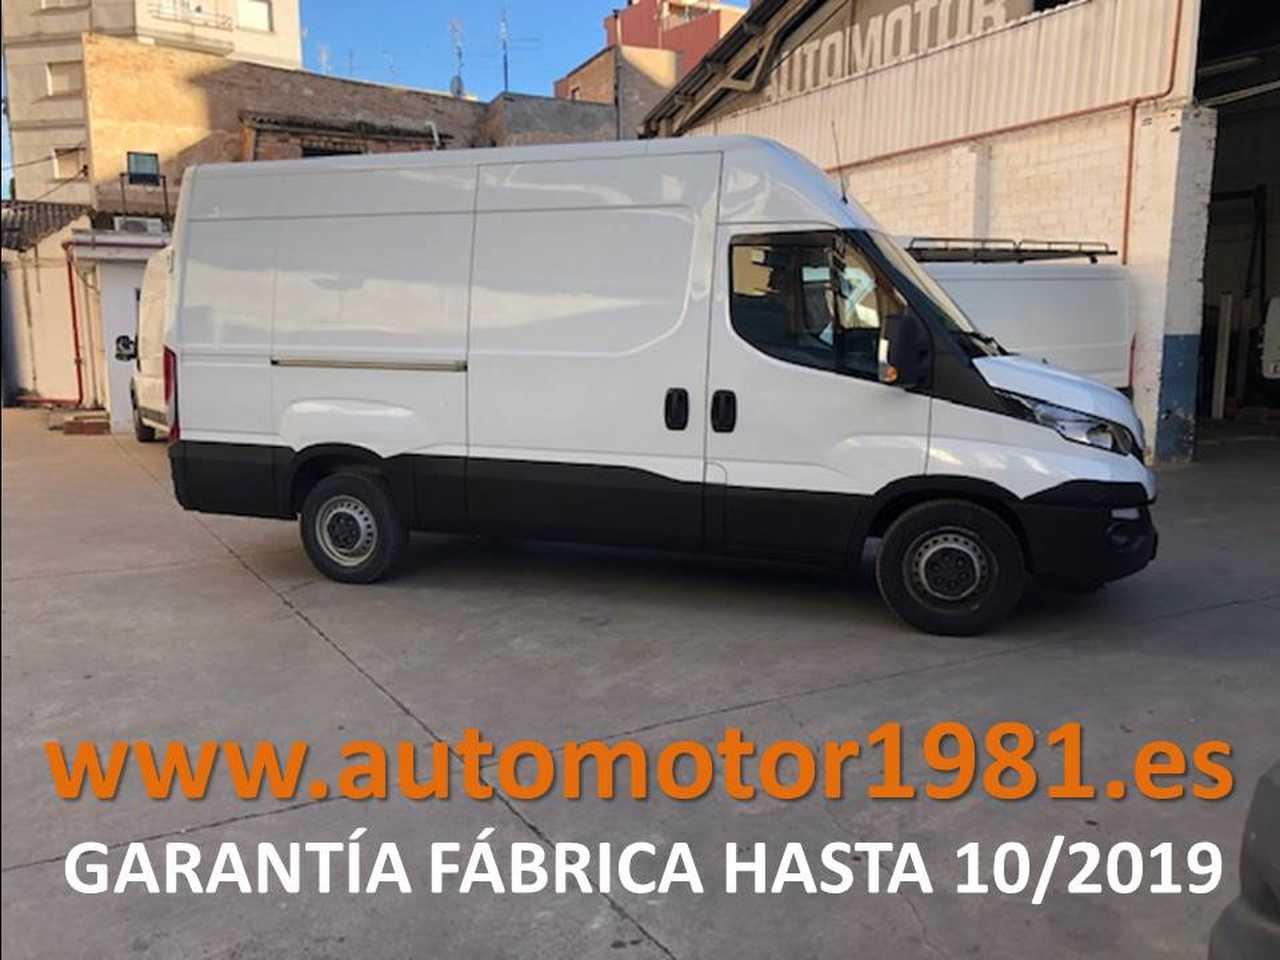 Iveco Daily 35 S 11 L3H2 FURGON - GARANTIA FABRICA HASTA 10/2019  - Foto 1